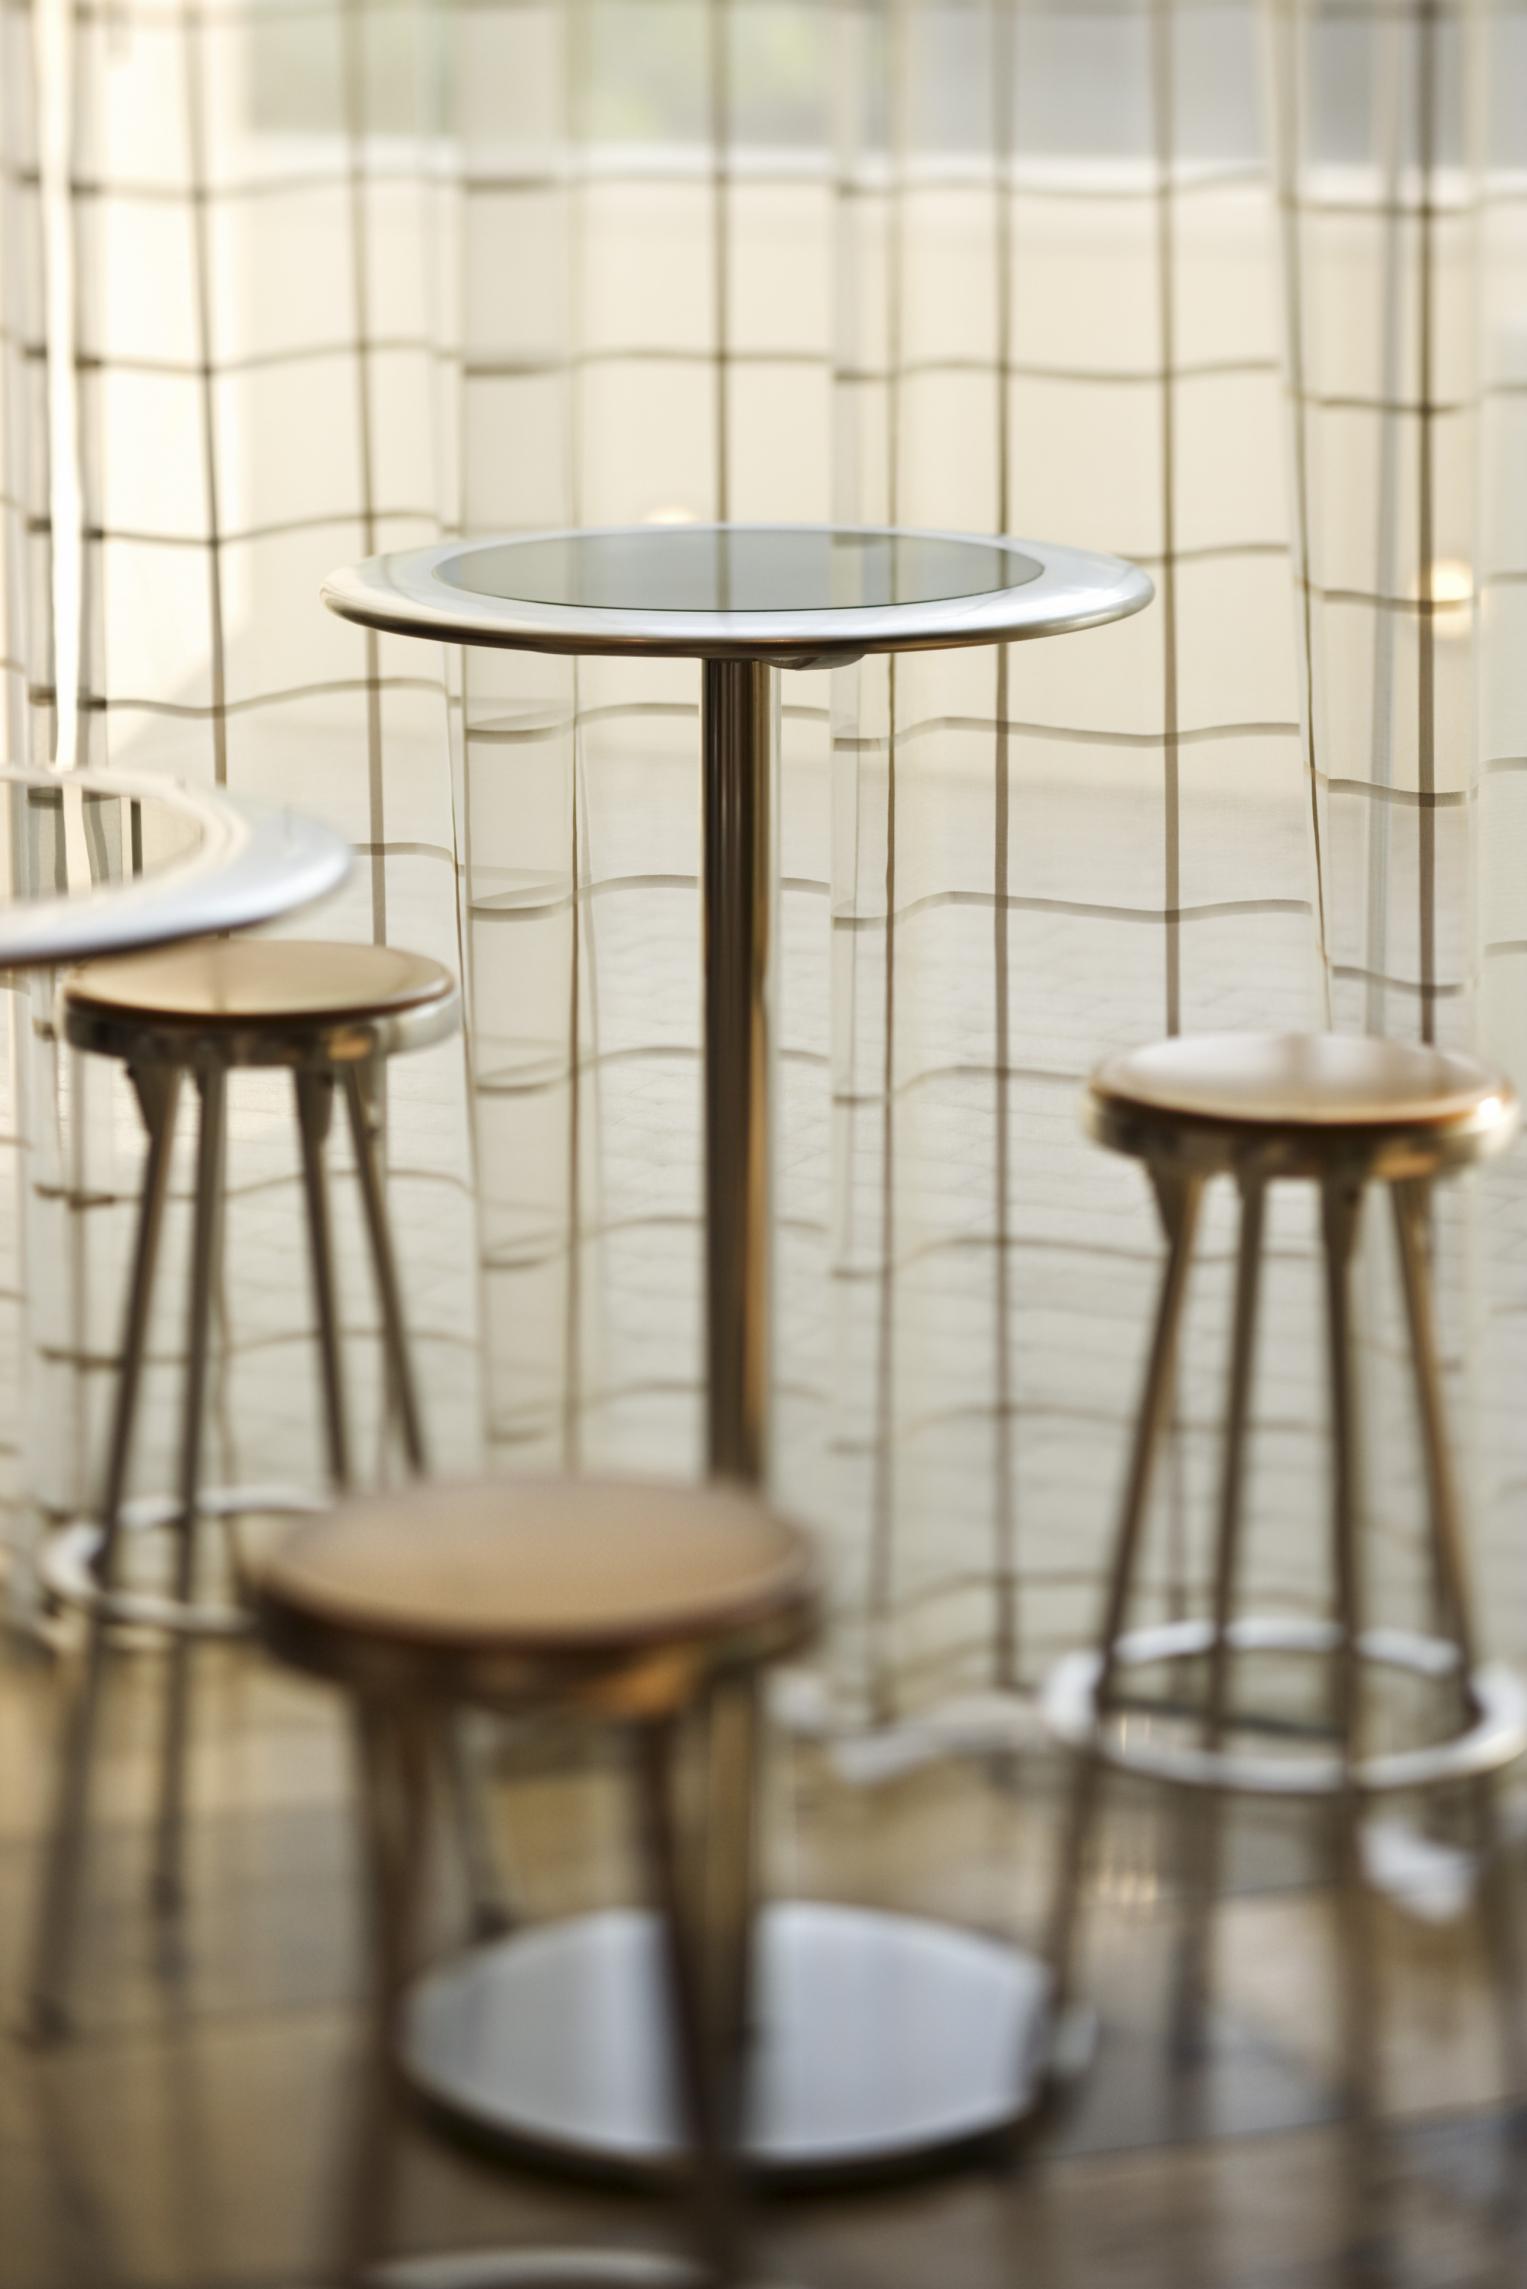 La mejor altura de una silla para una mesa de barra |